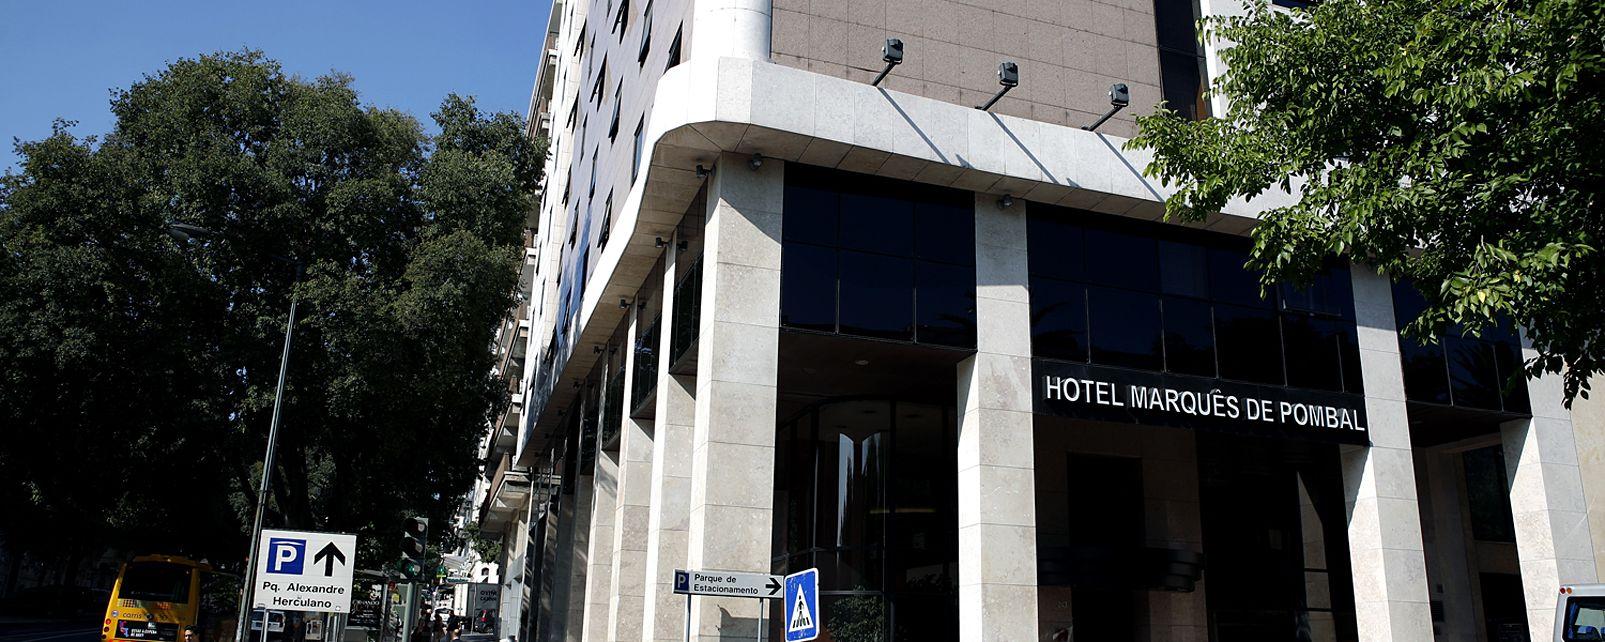 Hotel Marquês de Pombal